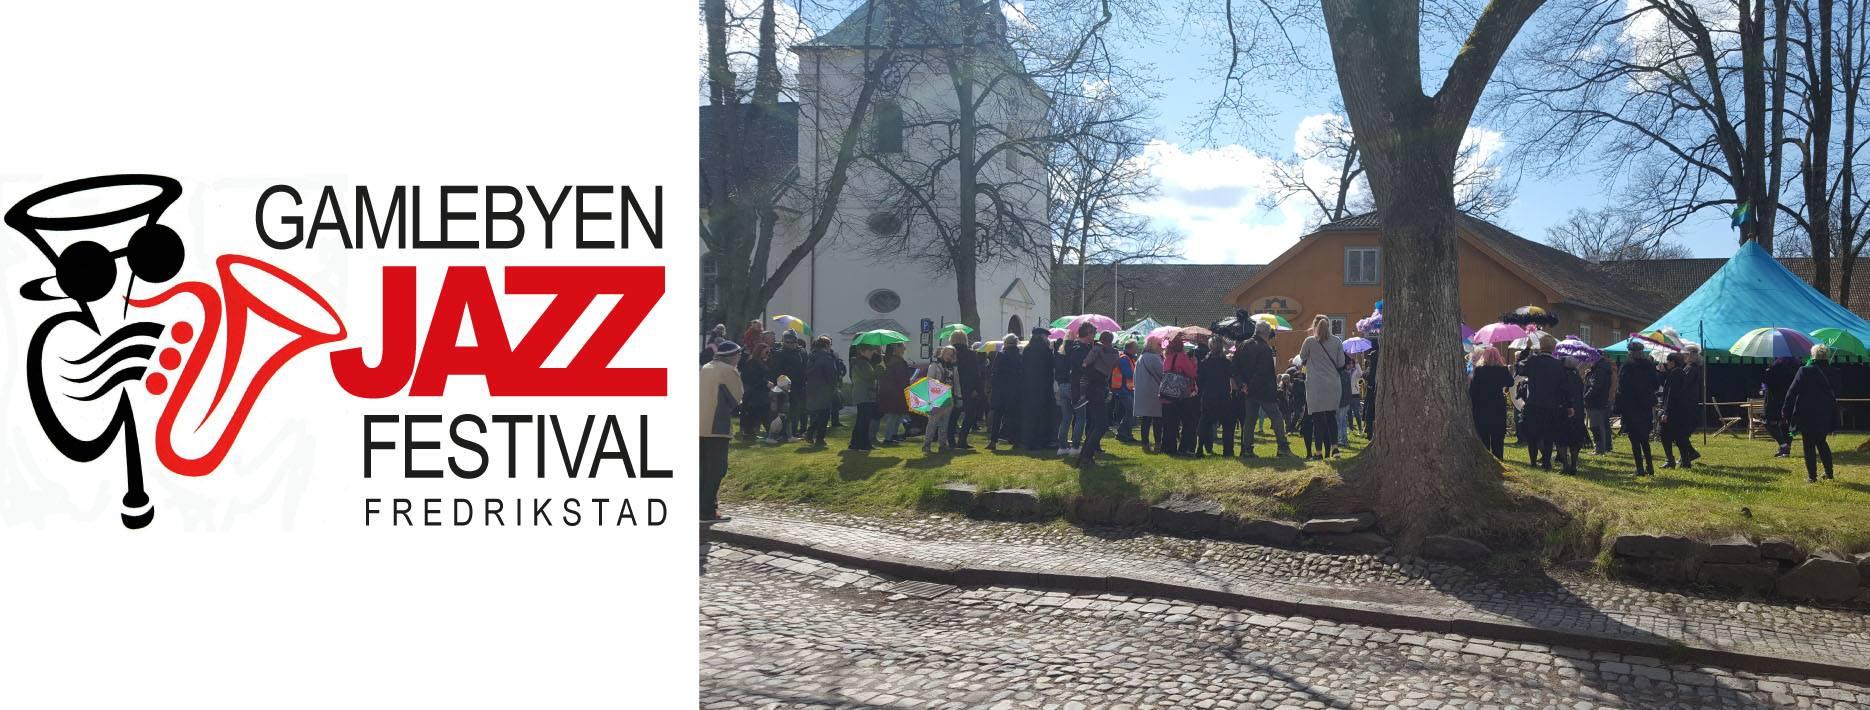 Gamlebyen Jazzfestival 1718780_o.jpg